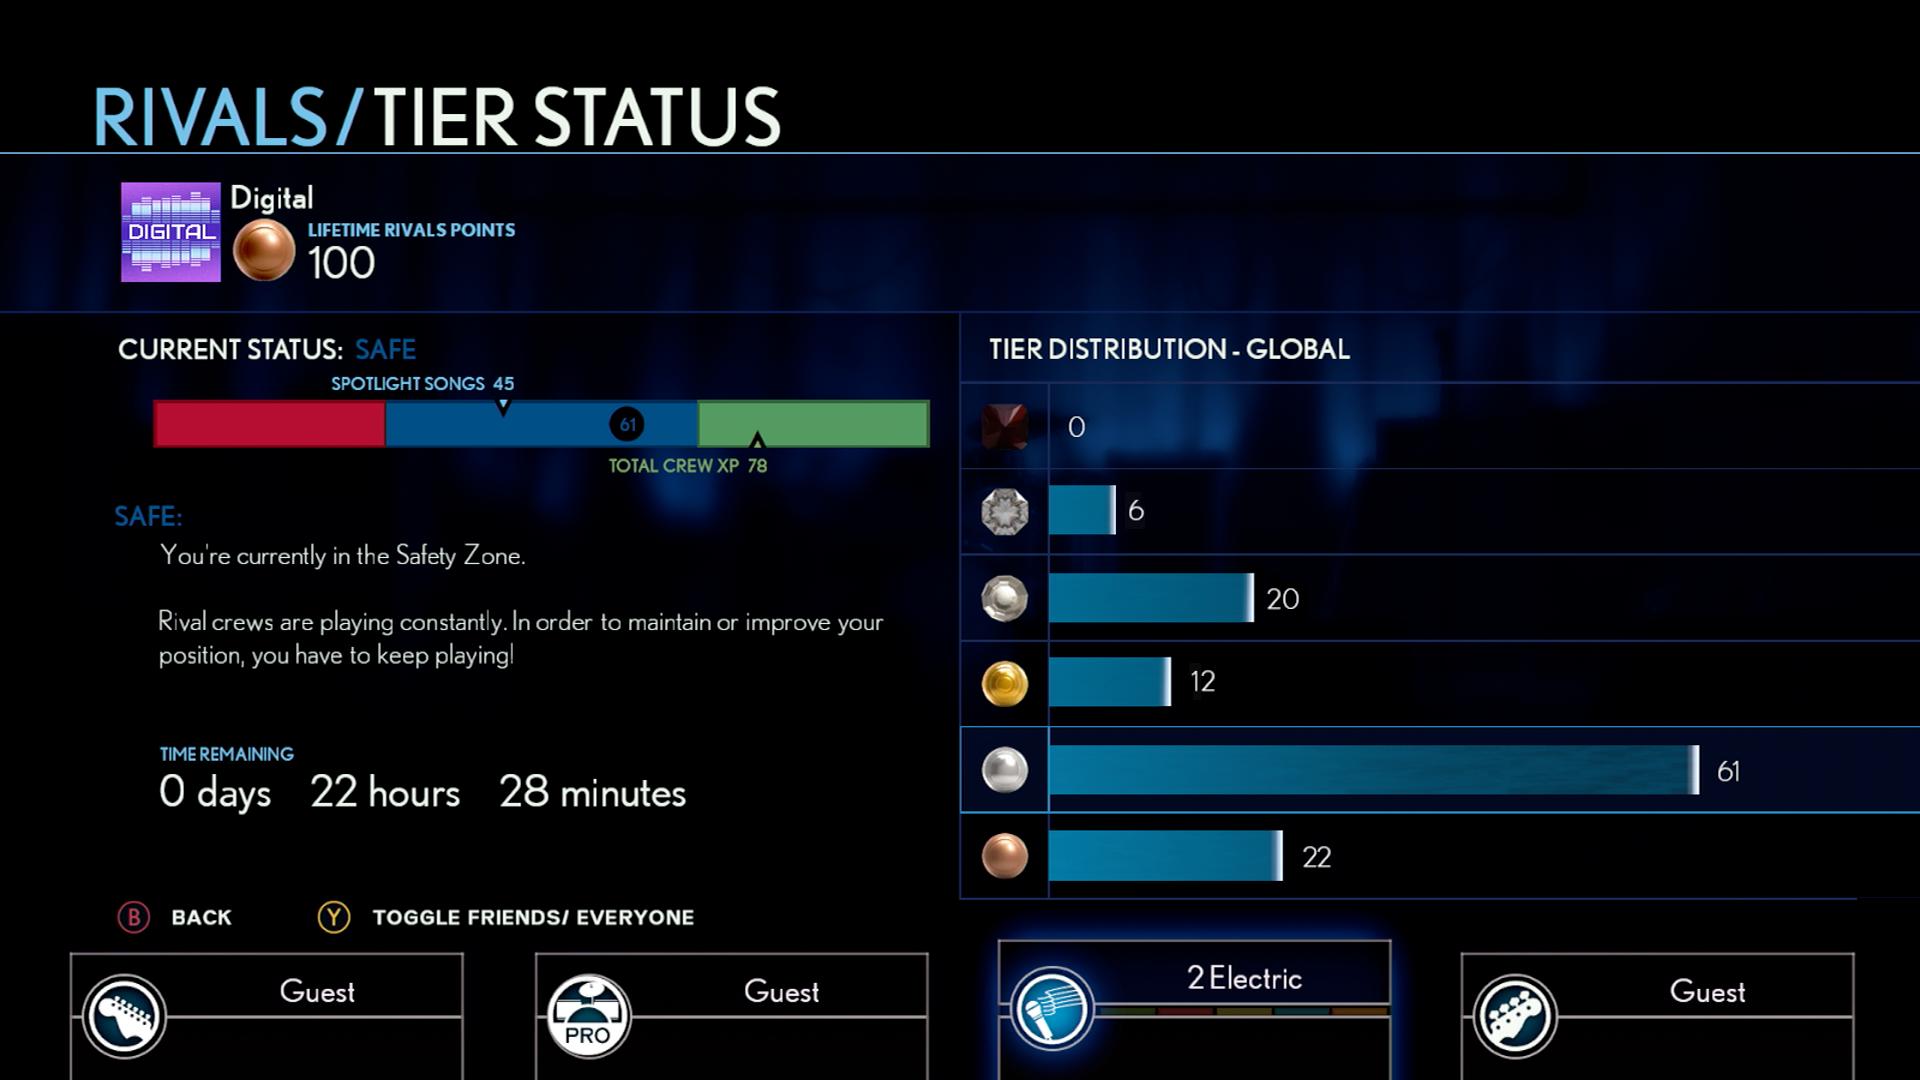 Tier Status